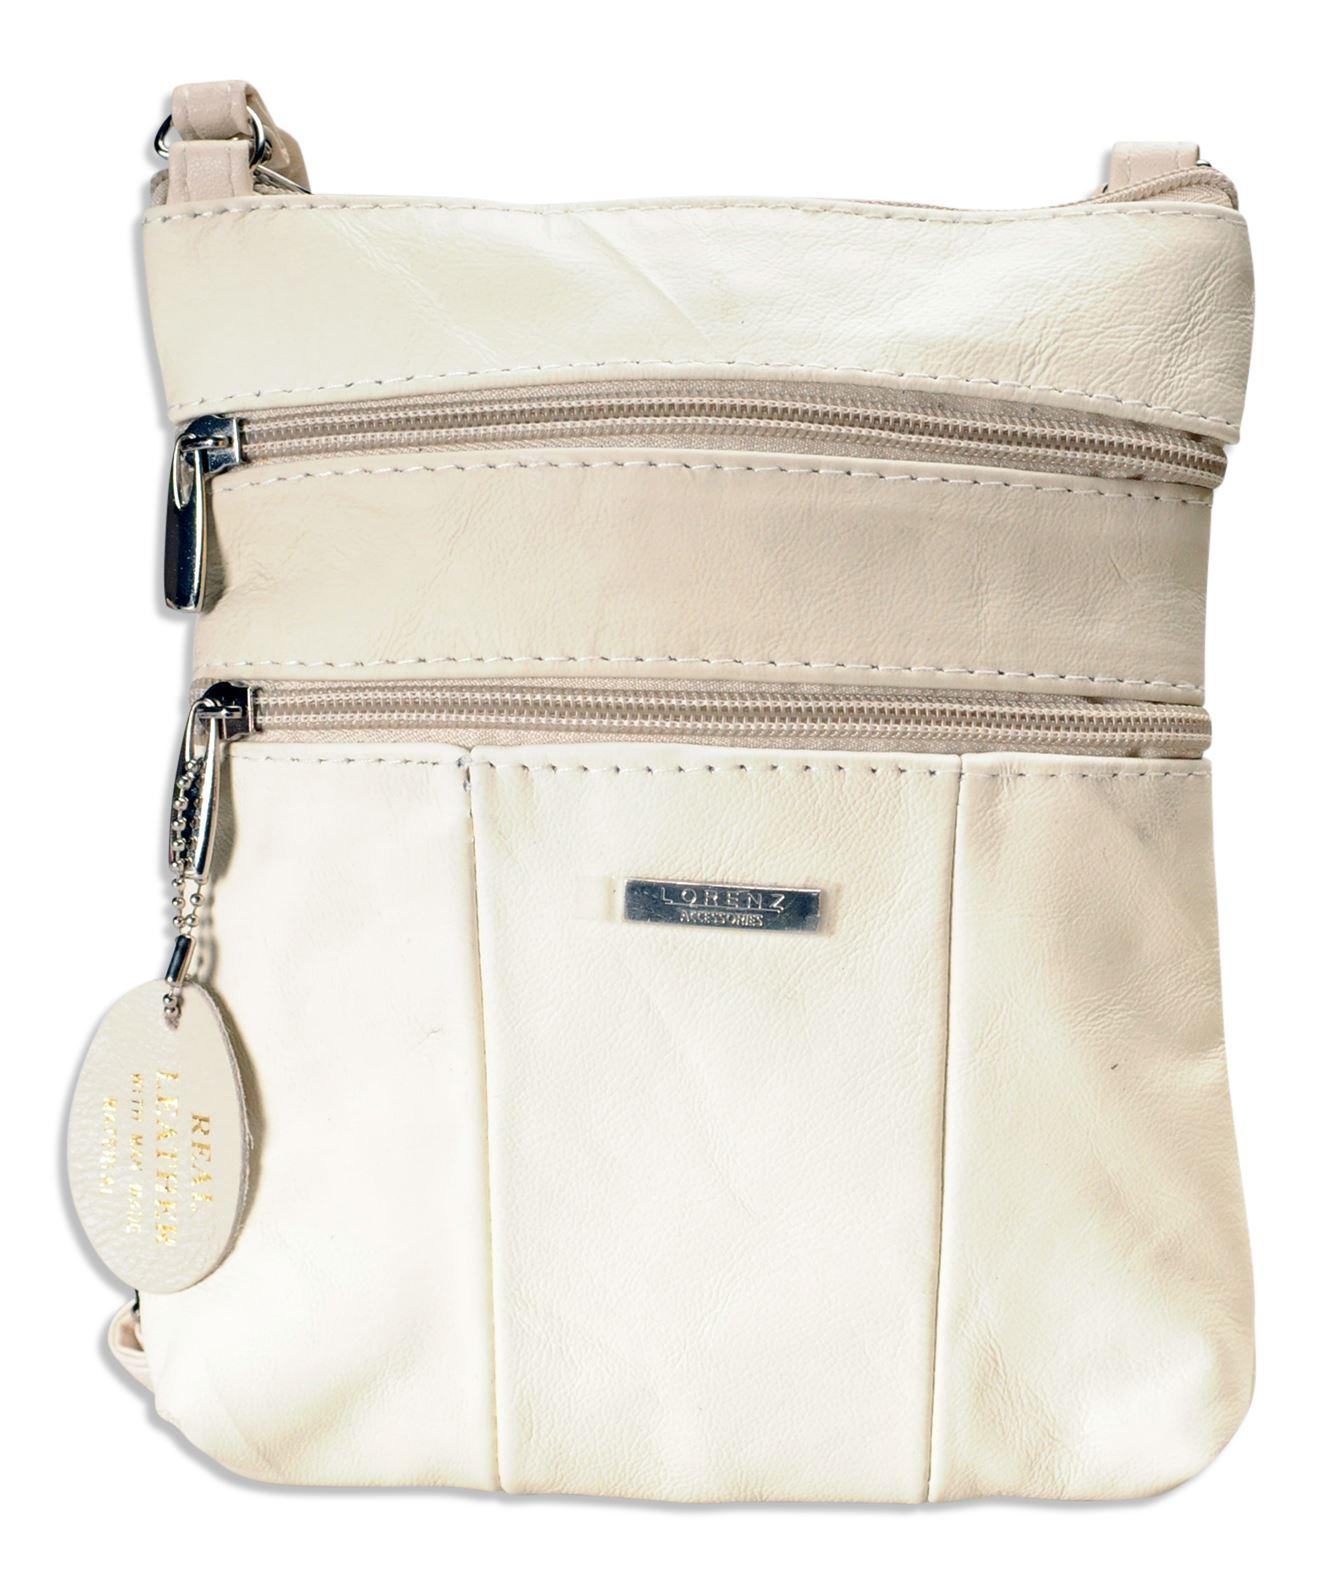 Lorenz-Genuine-Soft-Leather-Ladies-Cross-Body-Shoulder-Bag-Real-Womens-Medium